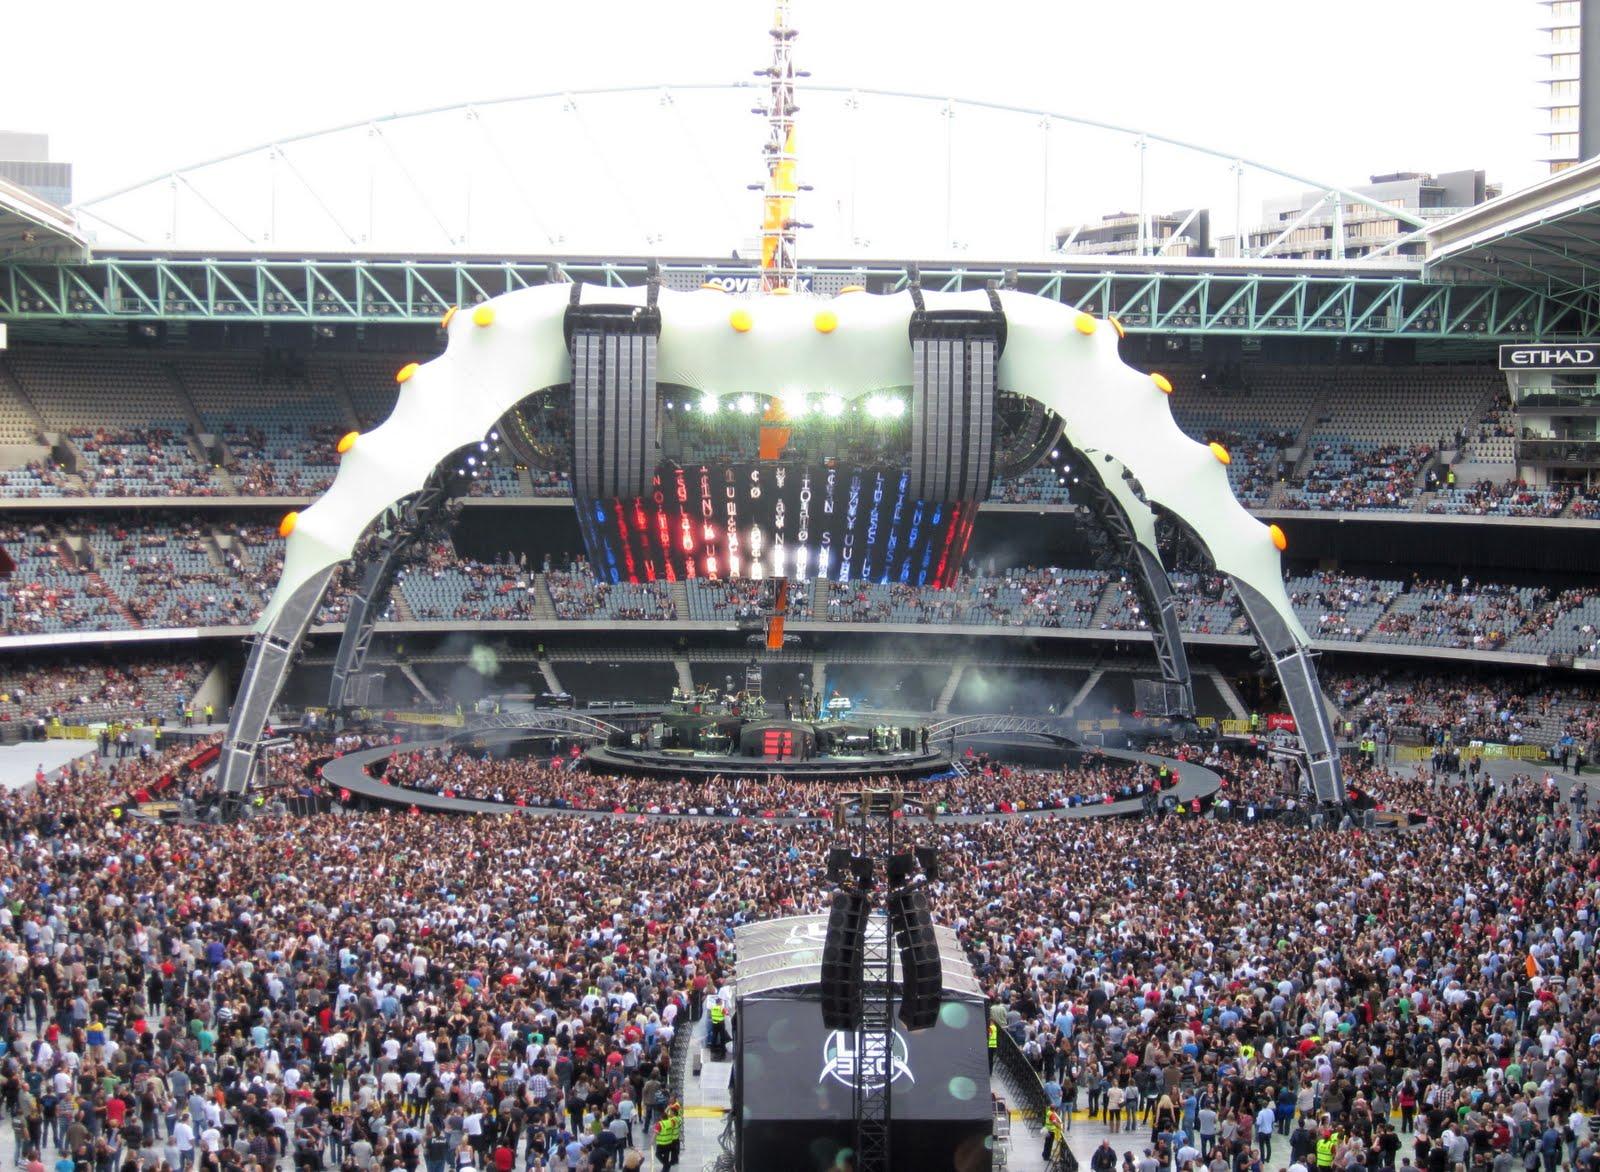 Parramatta Yankee: Jay-Z & U2 Conquer Melbourne